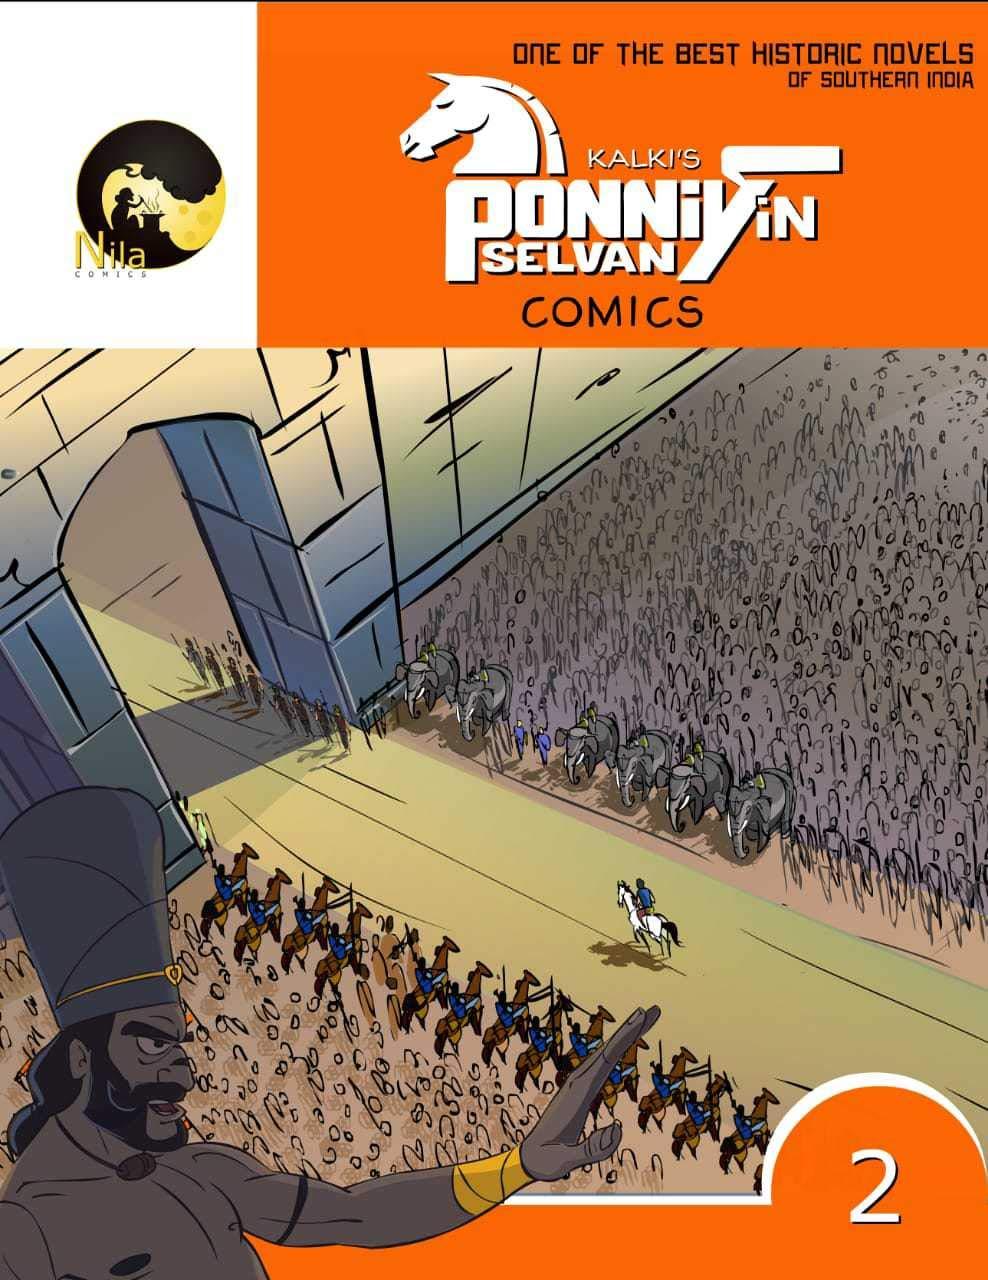 Kalki's Ponniyin Selvan Comics - Volume 2